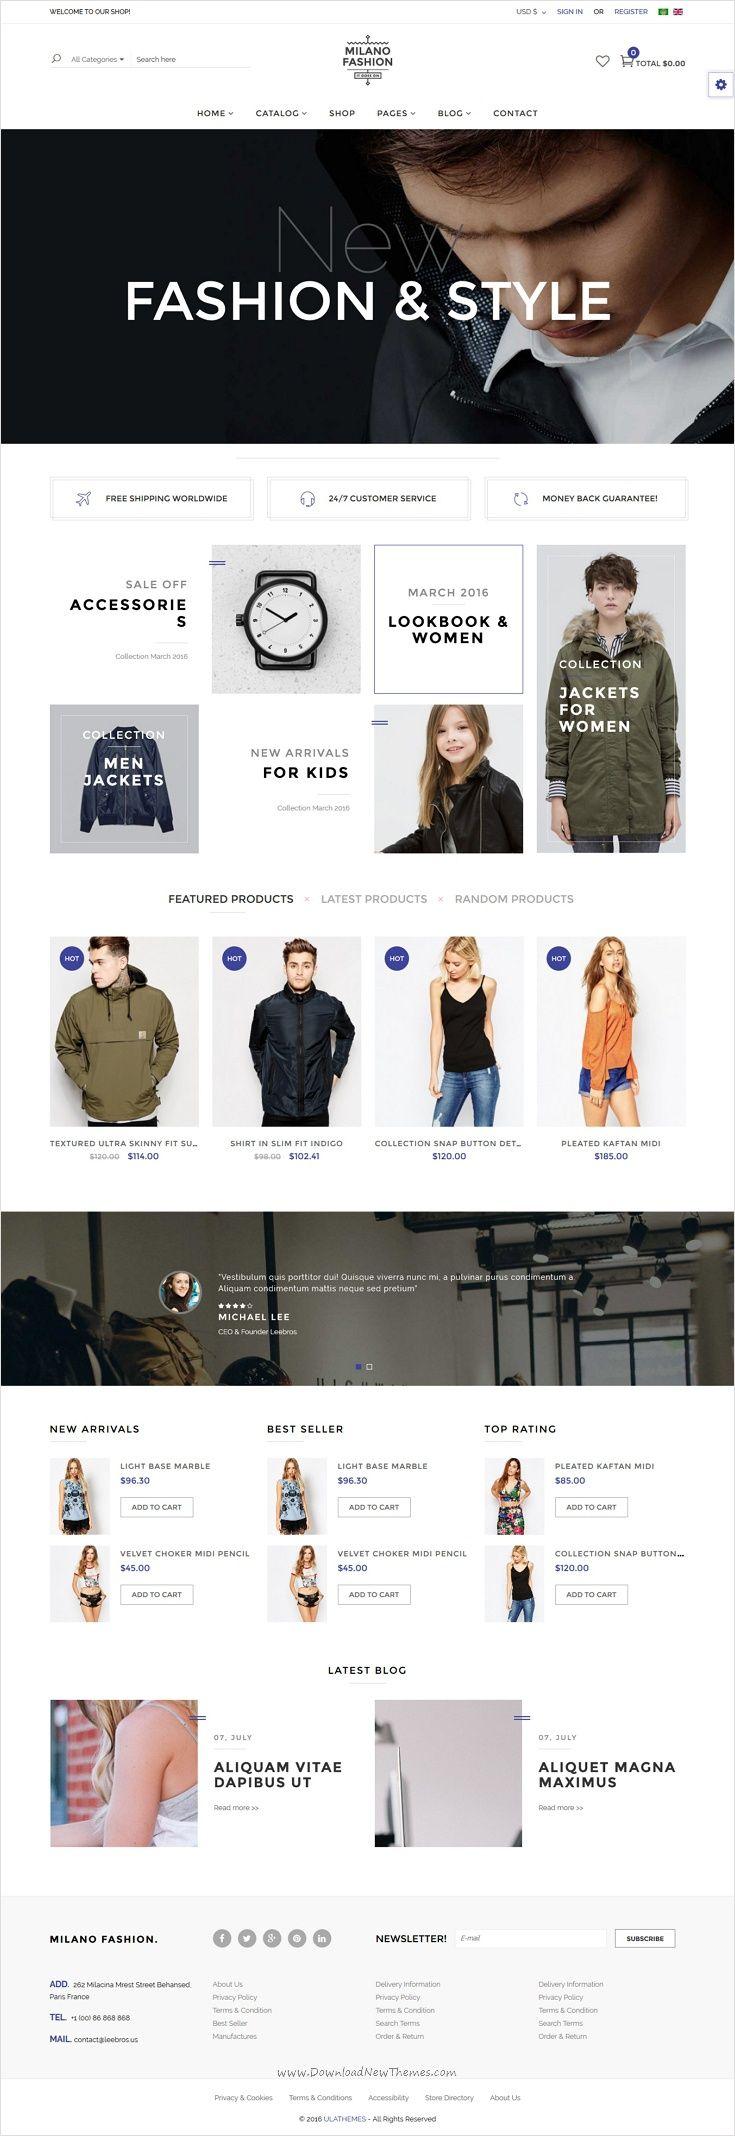 Joomla tshirt design - Milano Is Perfectly Design Responsive Virtuemart Joomla Template For Amazing Ecommerce Website With